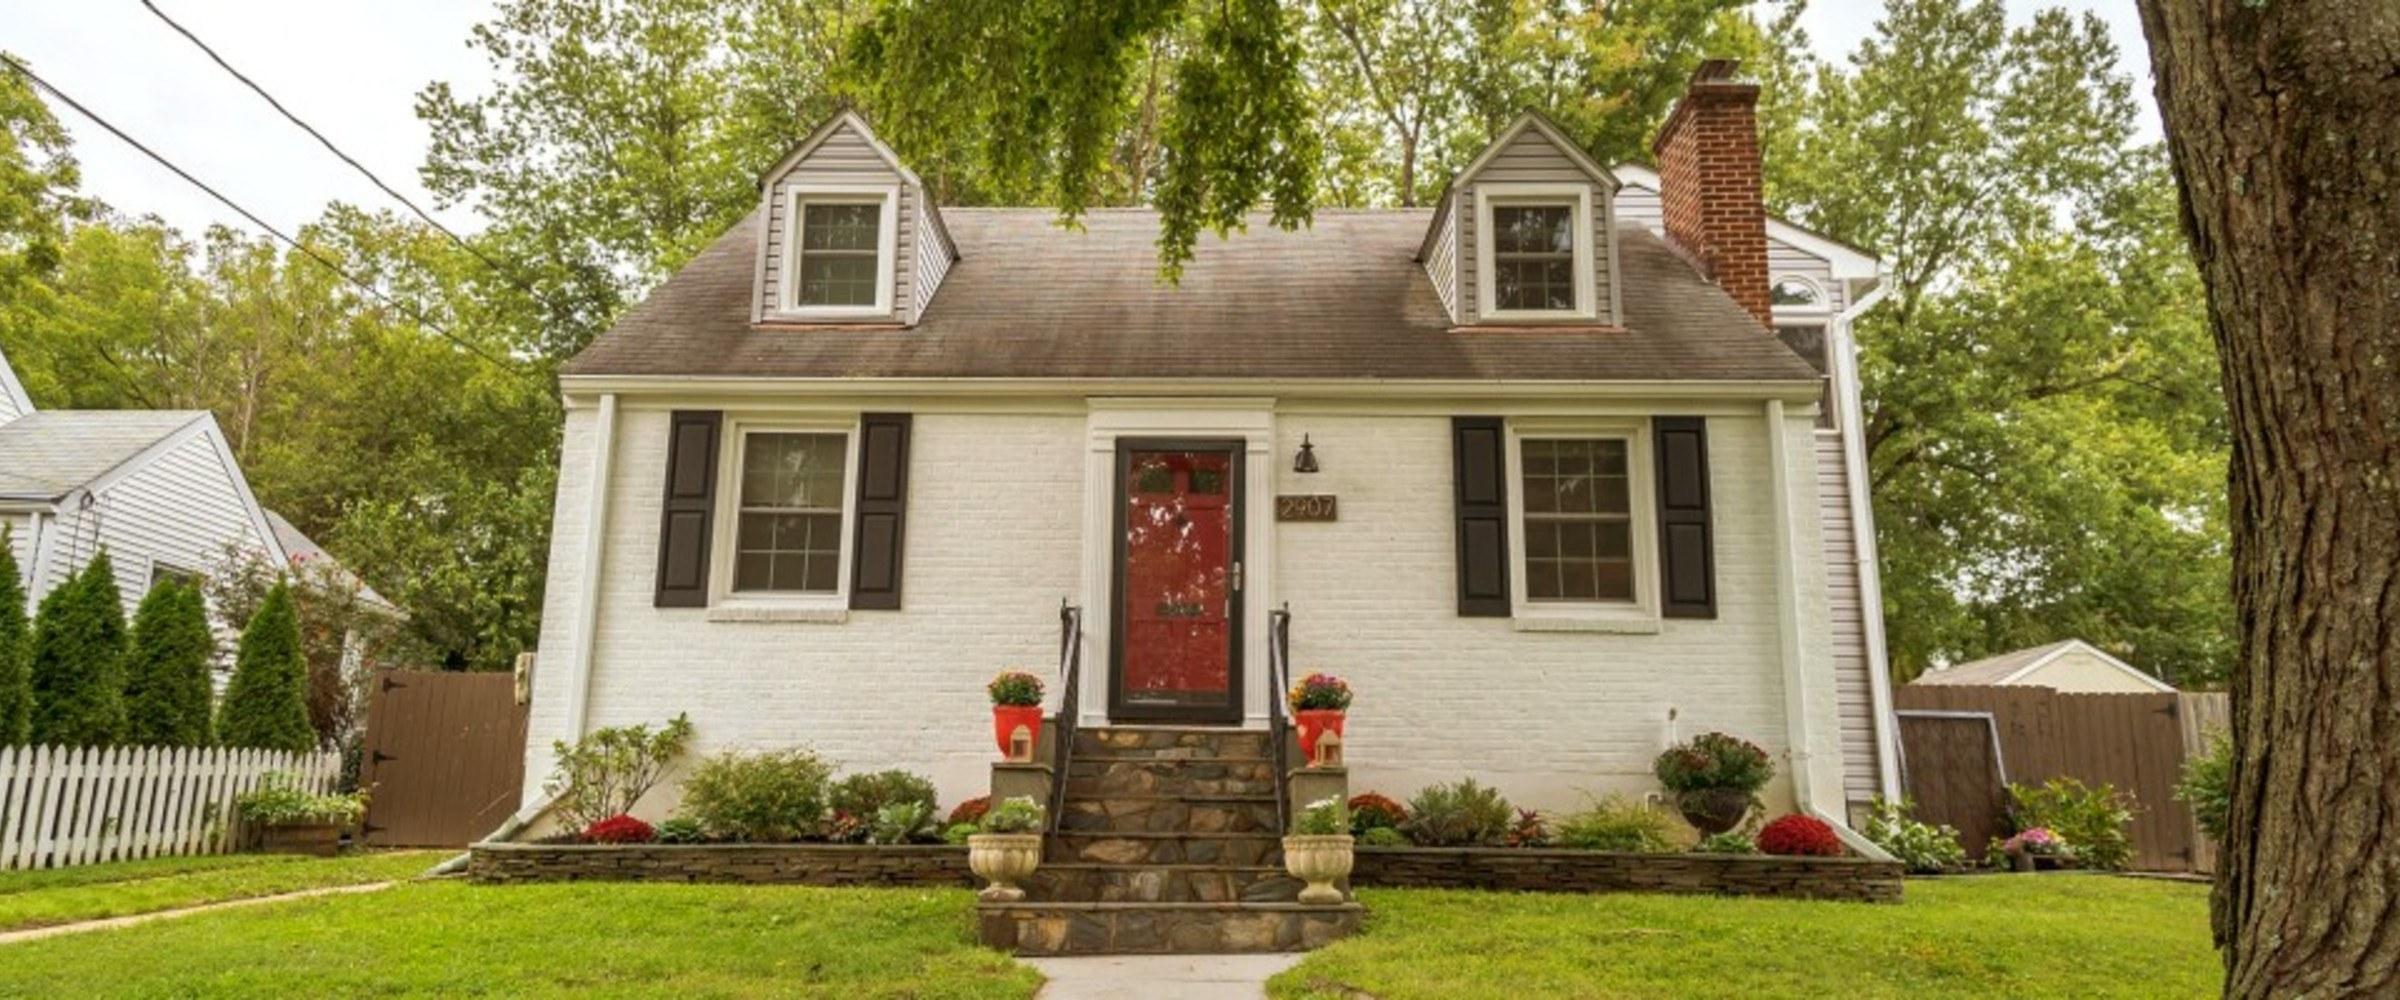 Housing Market Outlook for October